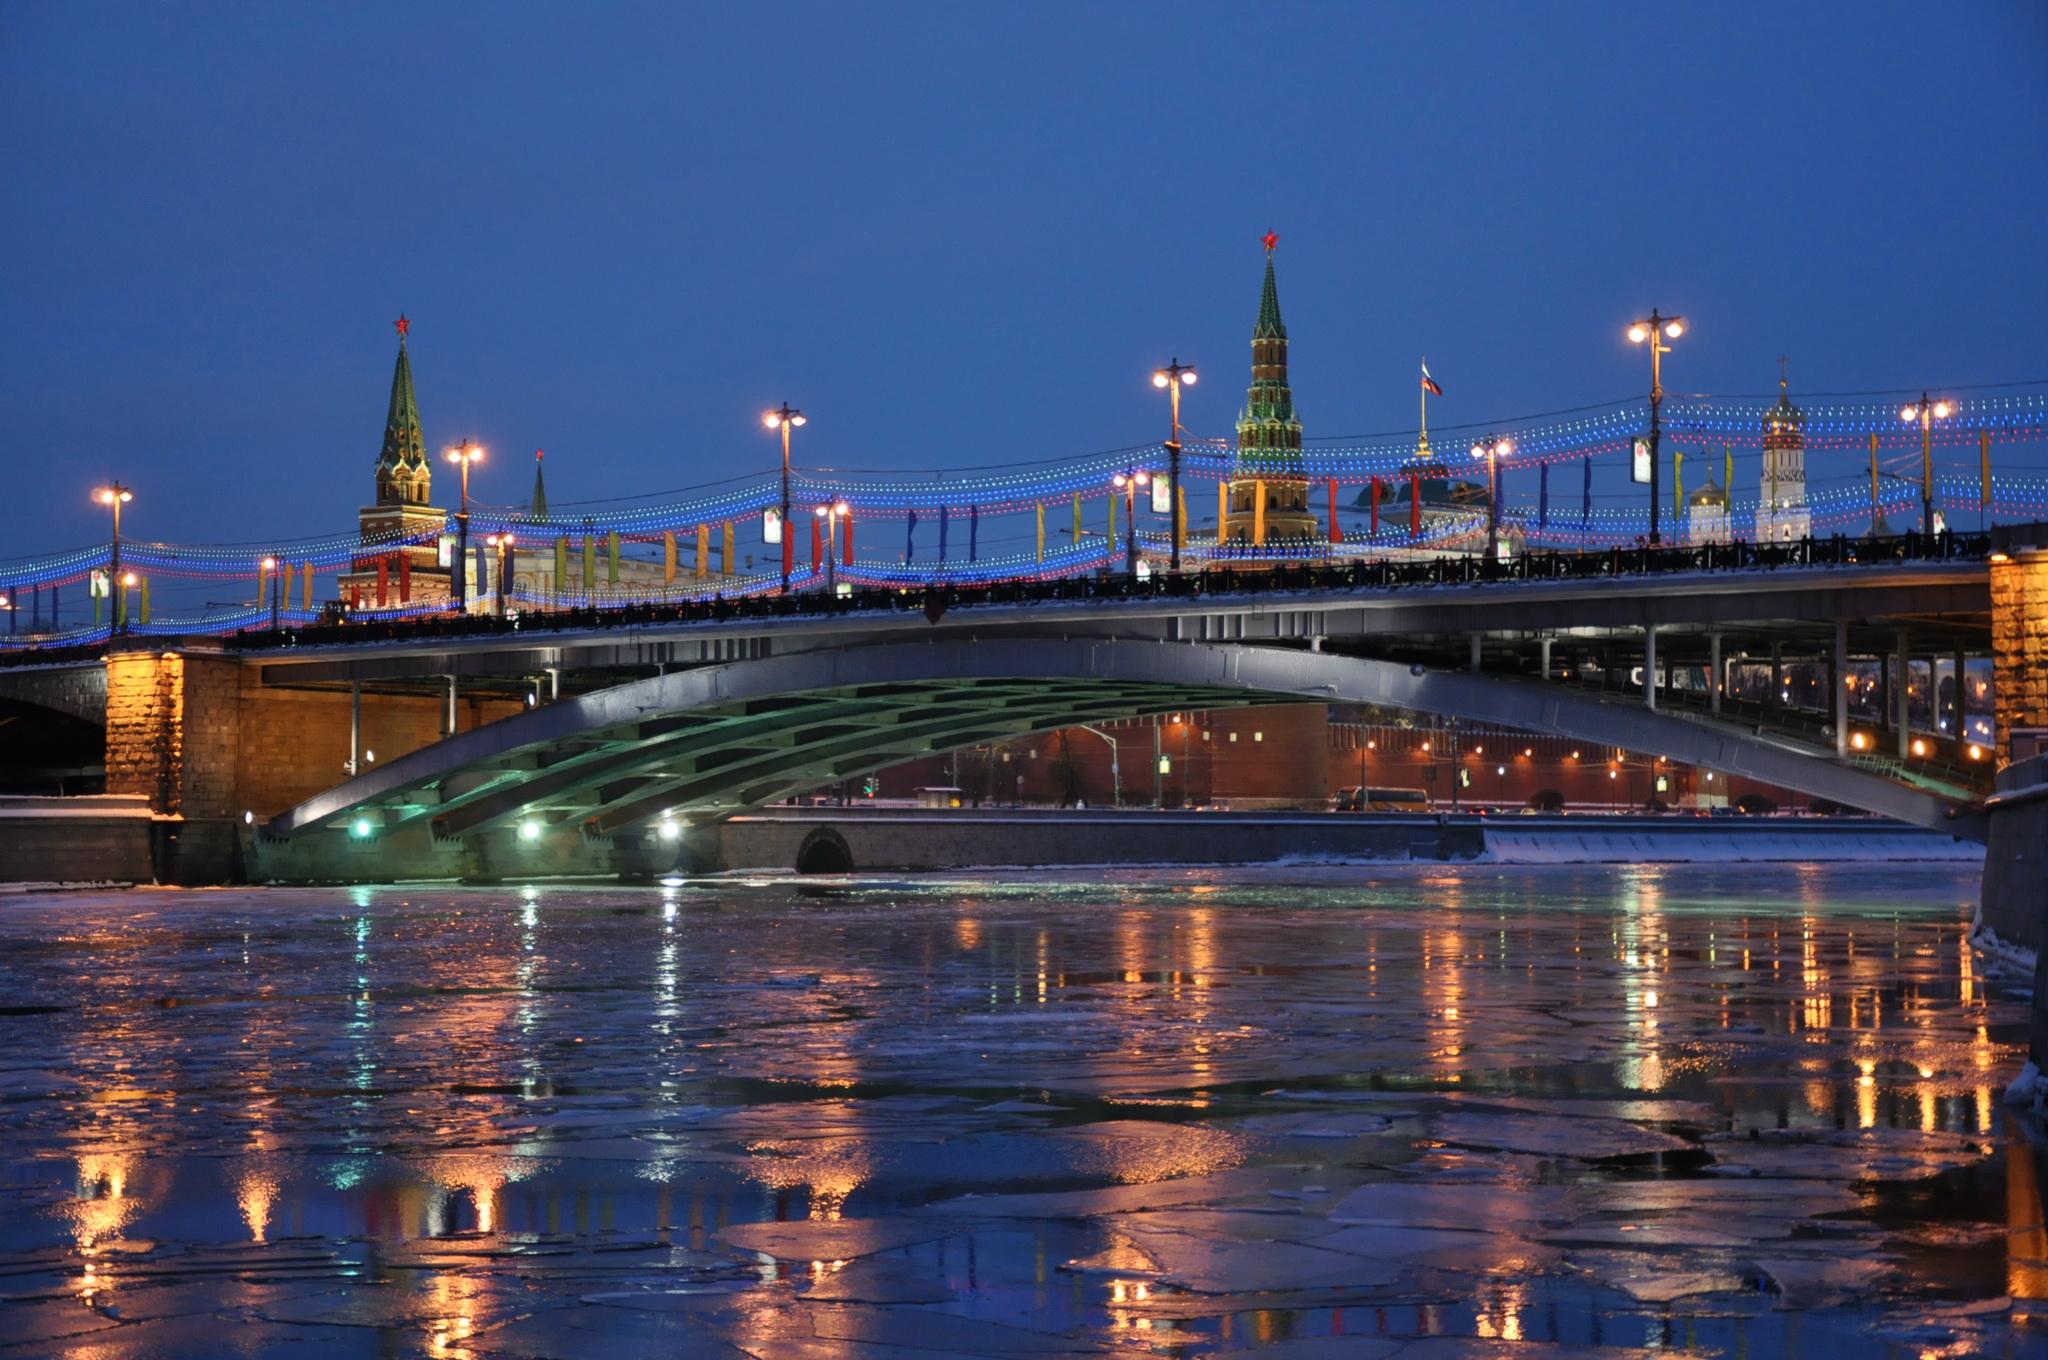 мост река россия the bridge river Russia без смс